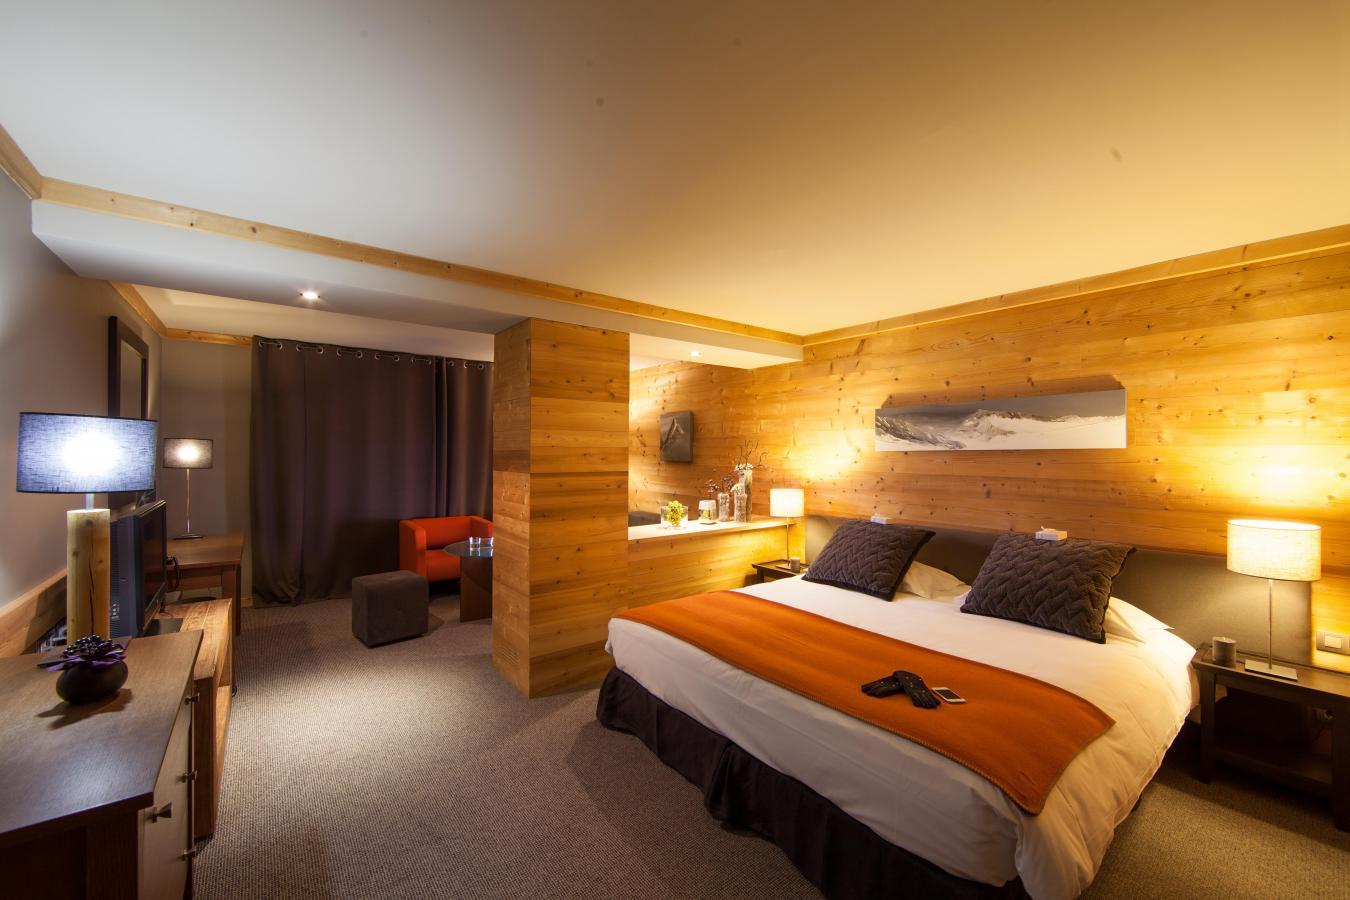 Chalet hotel le kaya les menuires location vacances ski for Hotel au ski